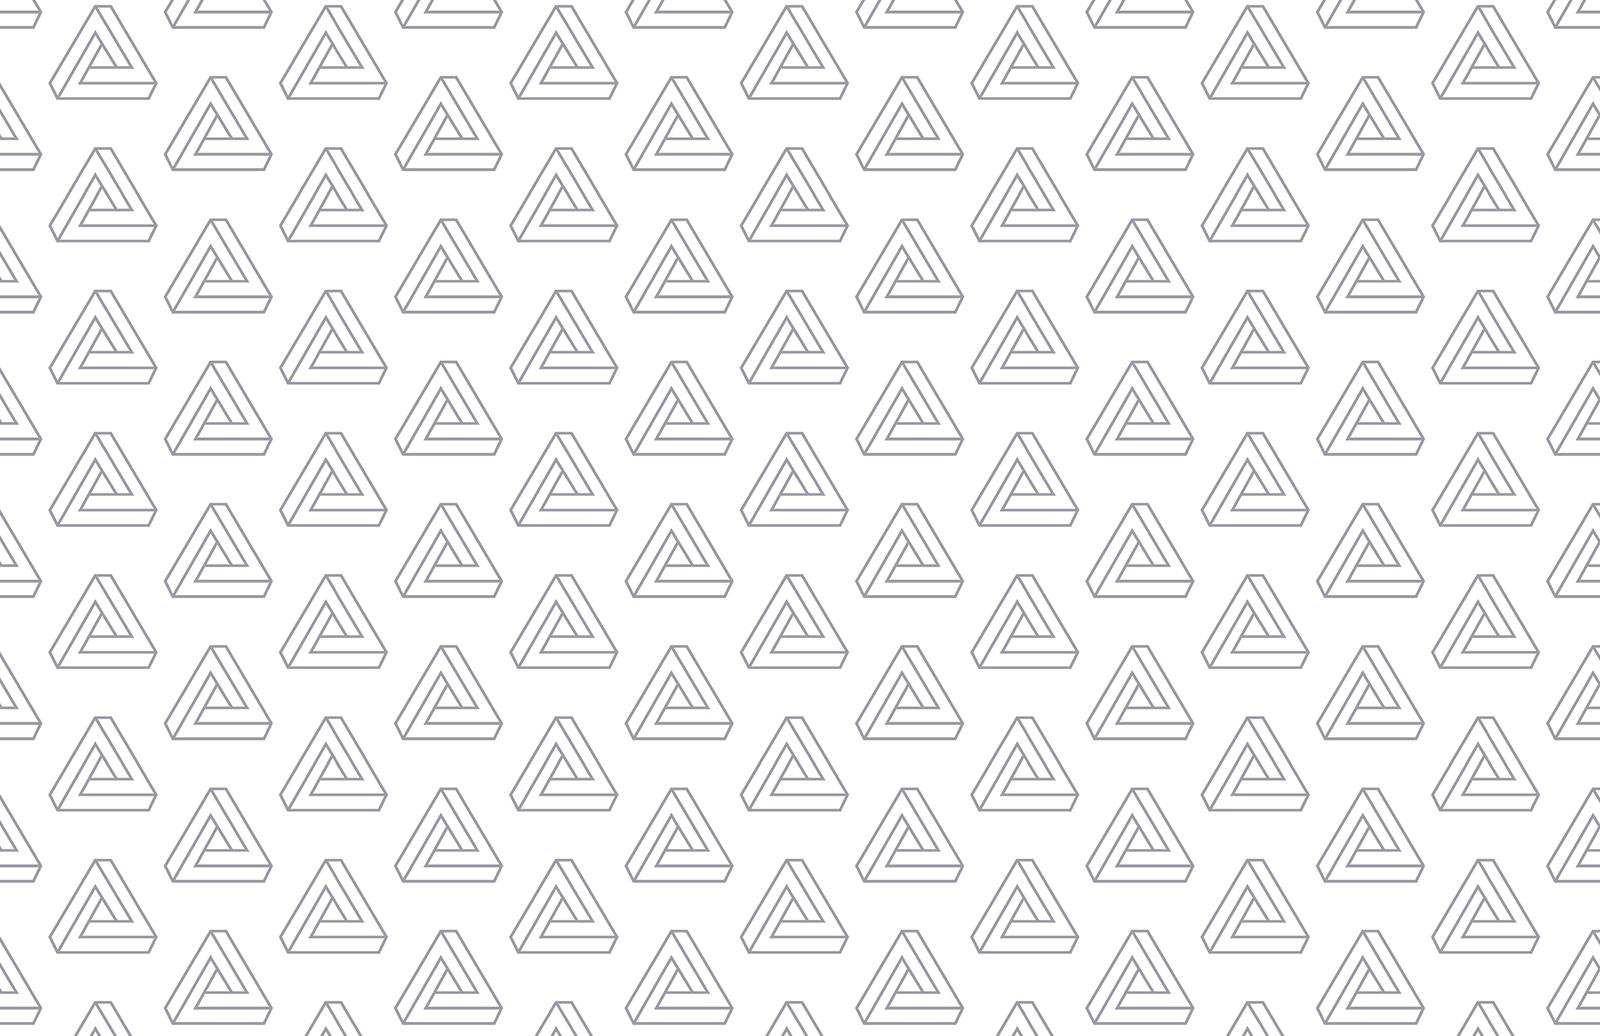 Minimal  Shape  Patterns  Preview 1A